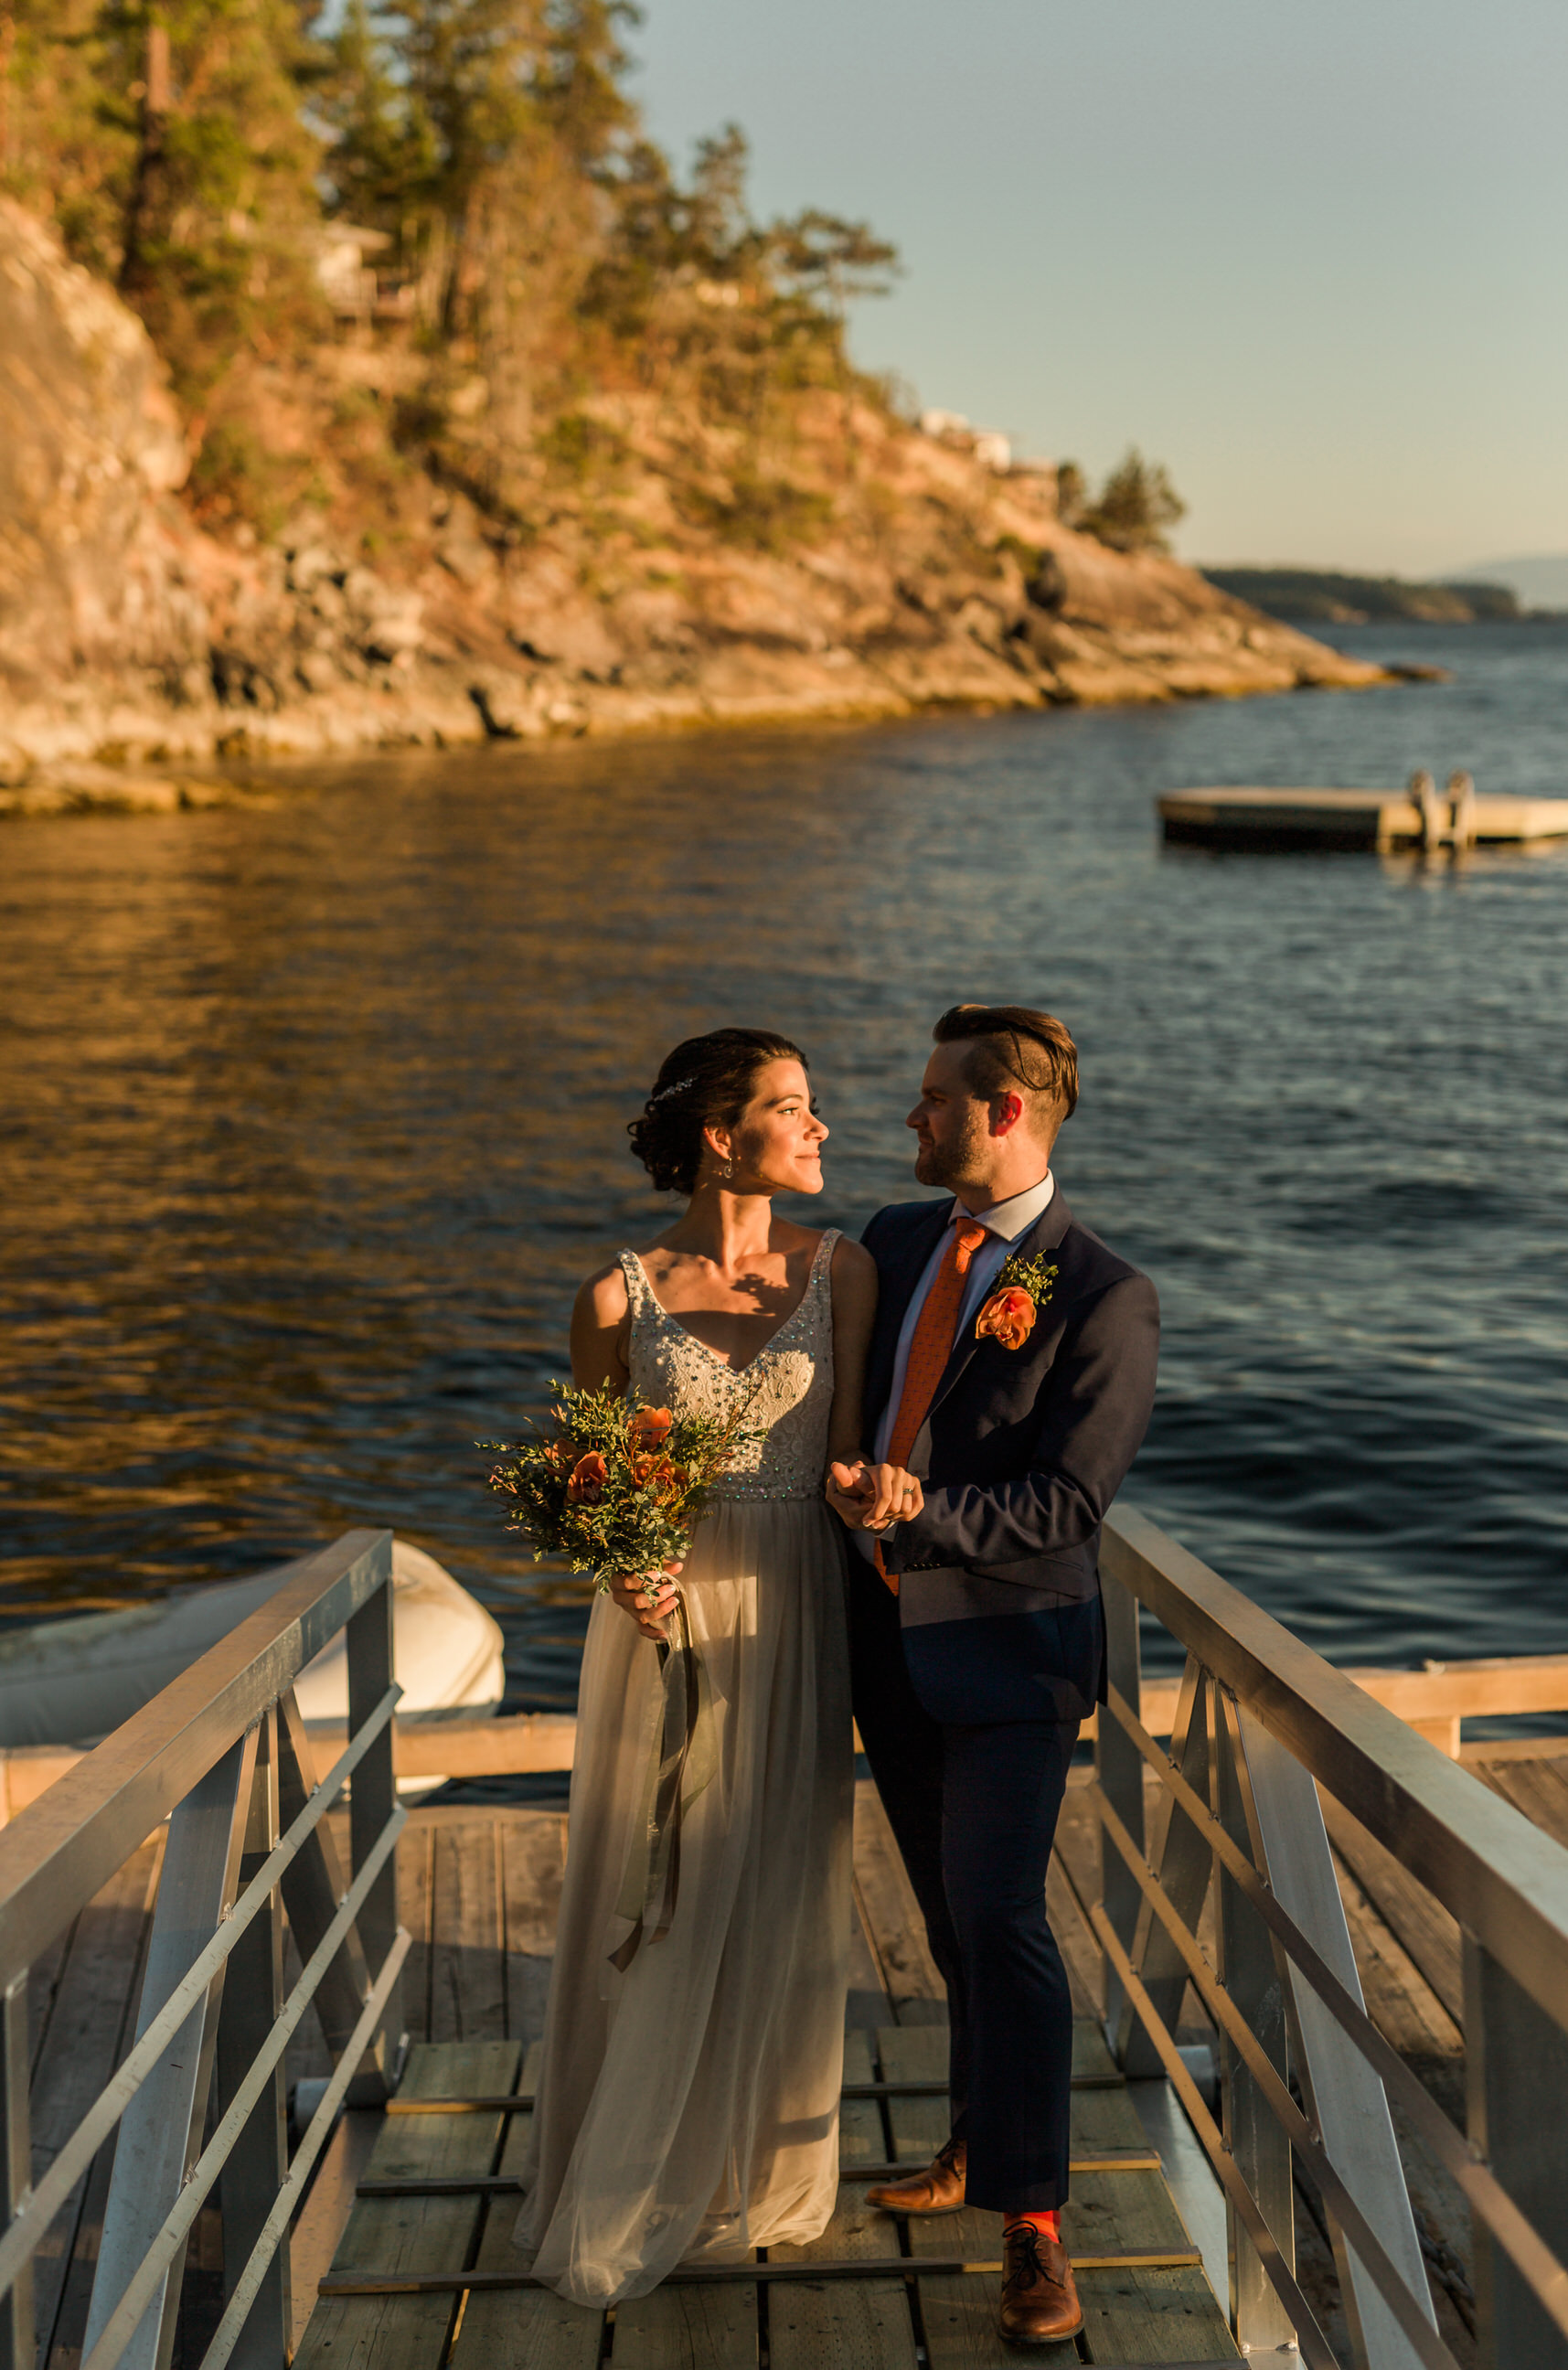 Rockwater Secret Cove Resort Wedding - Sunshine Coast BC Wedding Photographer - Vancouver Wedding Photographer - Sunshine Coast Elopement Photos - IMG_1428.jpg